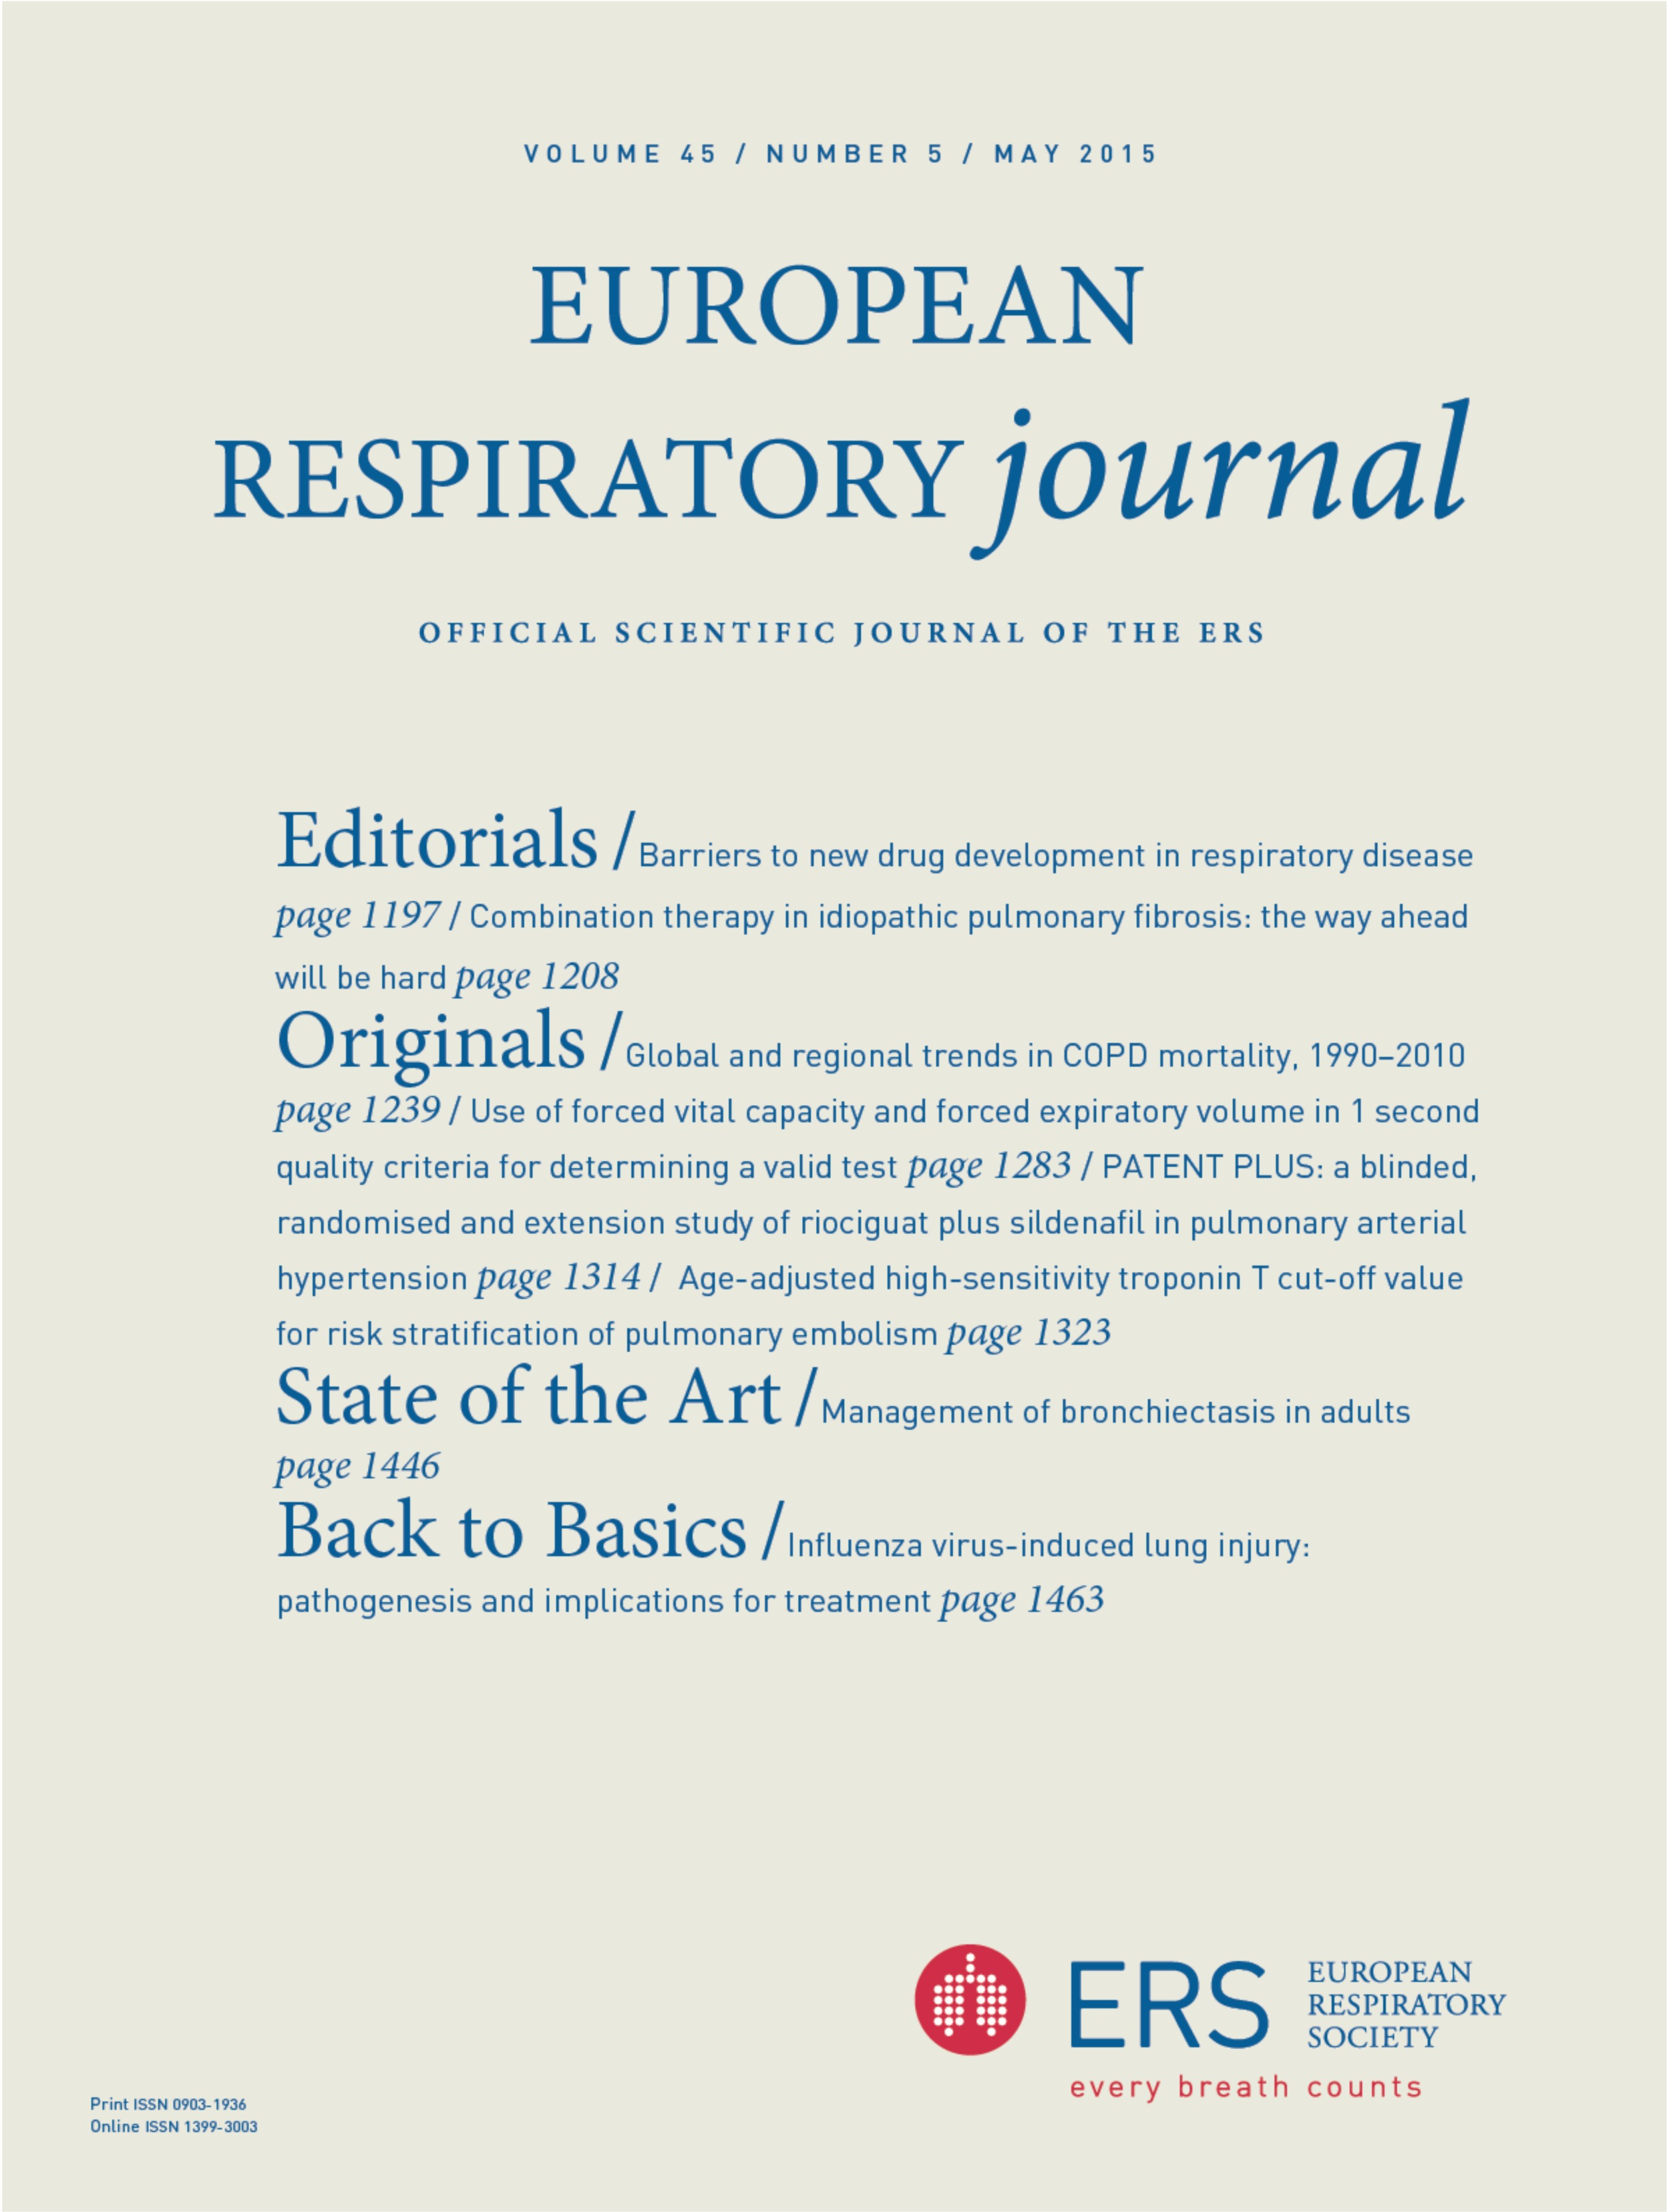 Influenza virus-induced lung injury: pathogenesis and